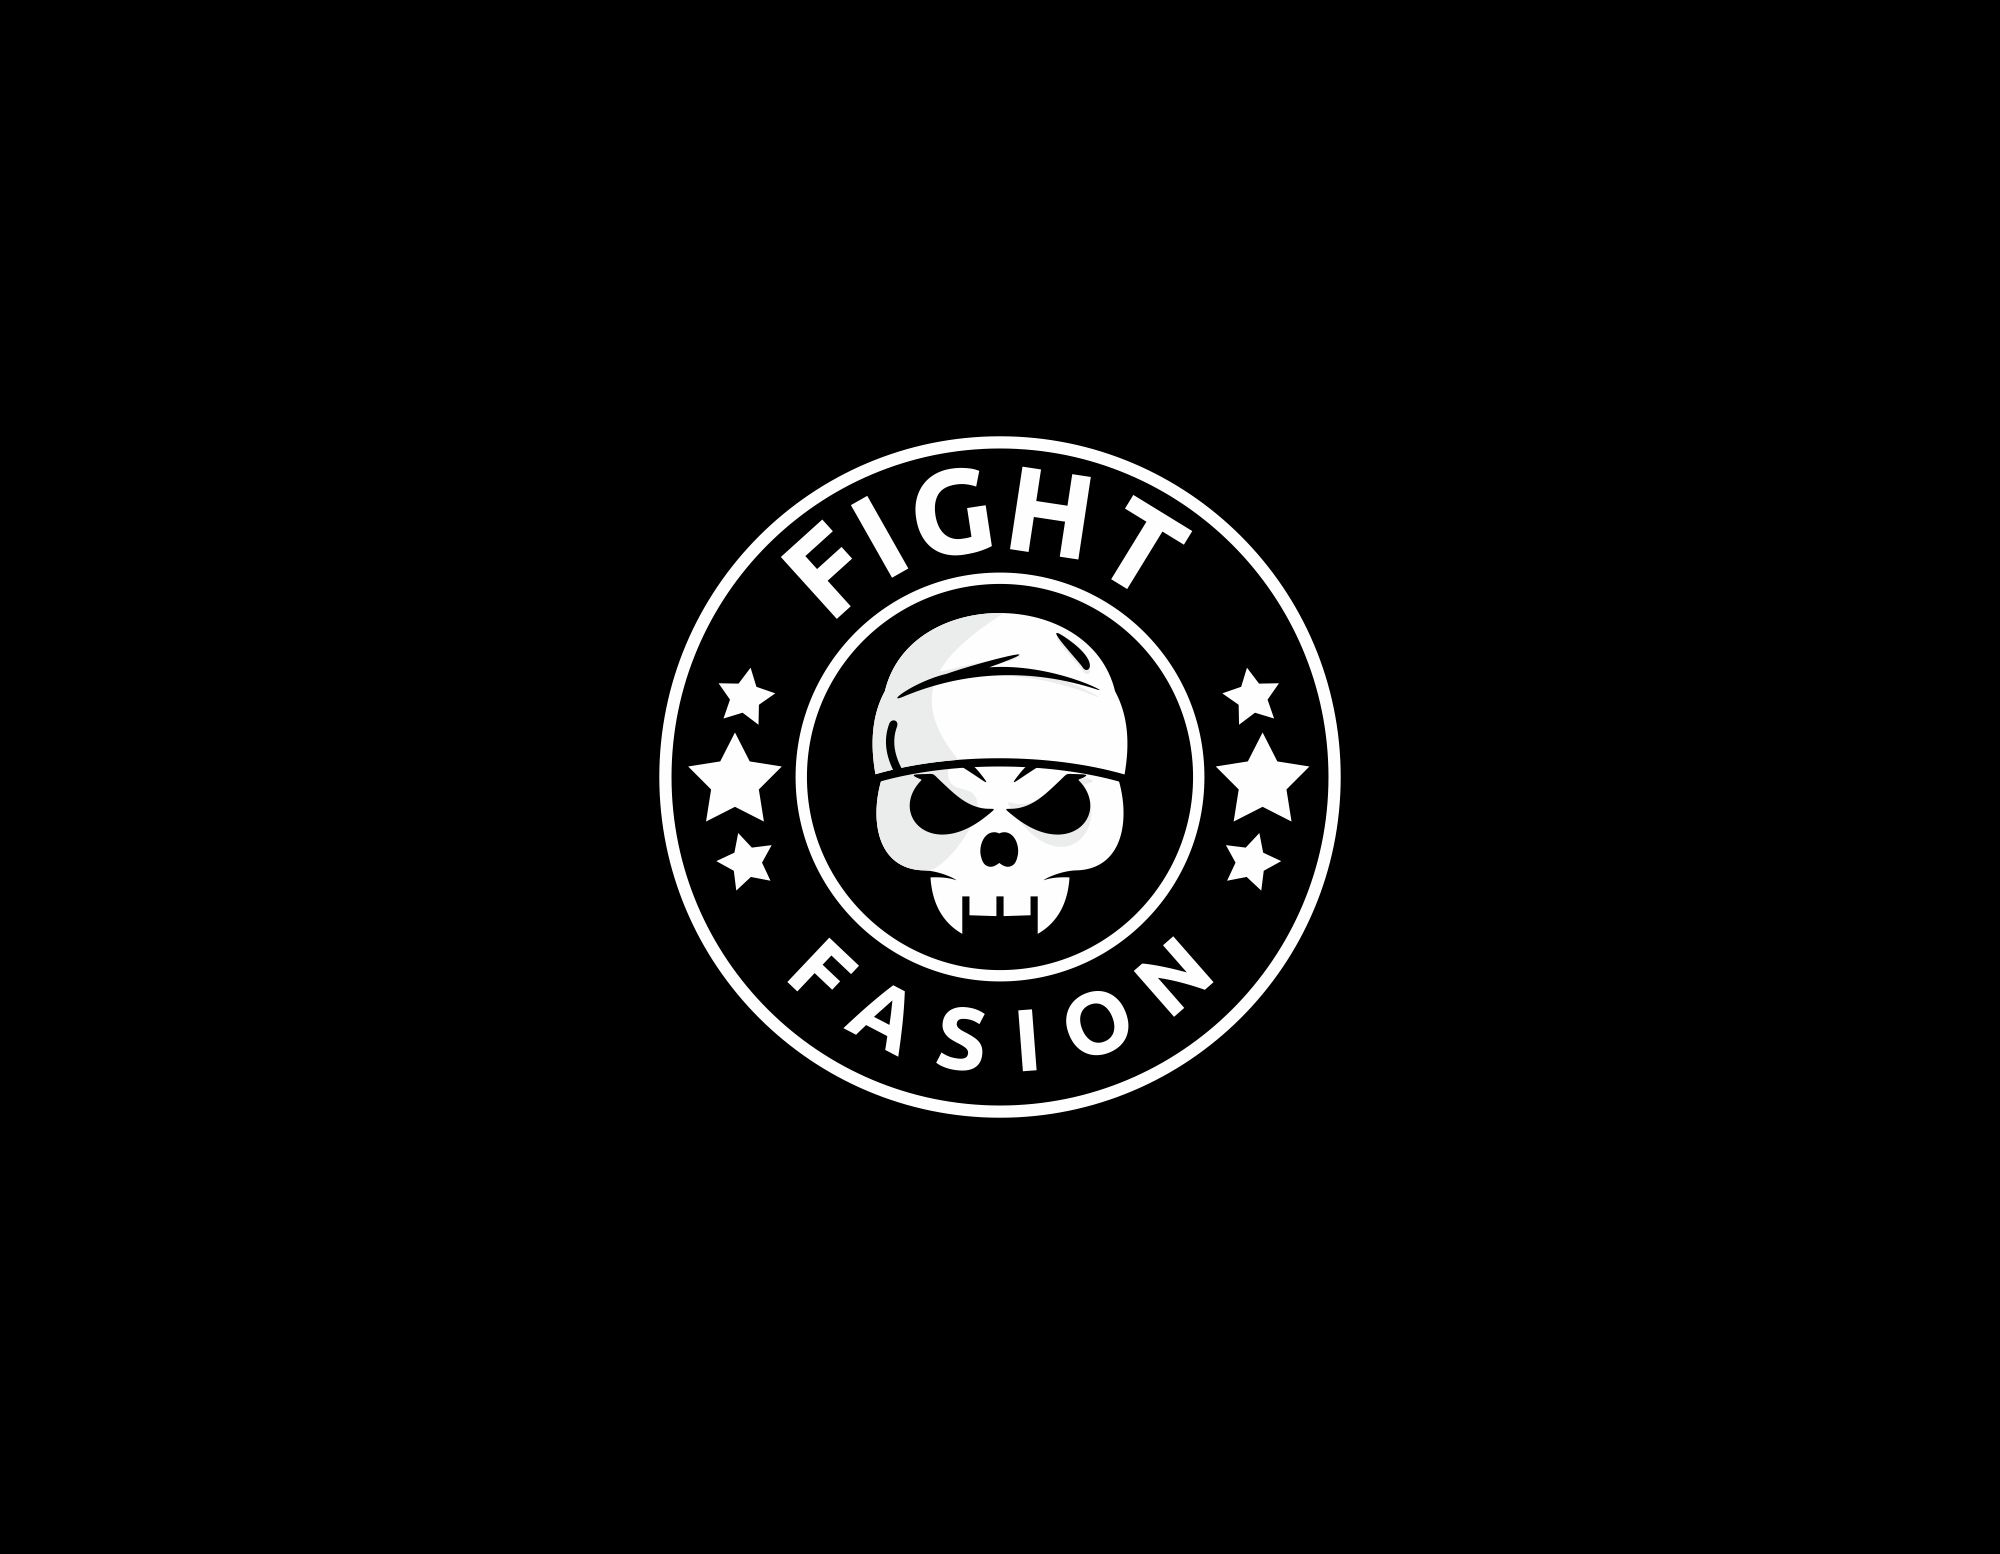 Логотип для Fight Fashion - дизайнер bilibob